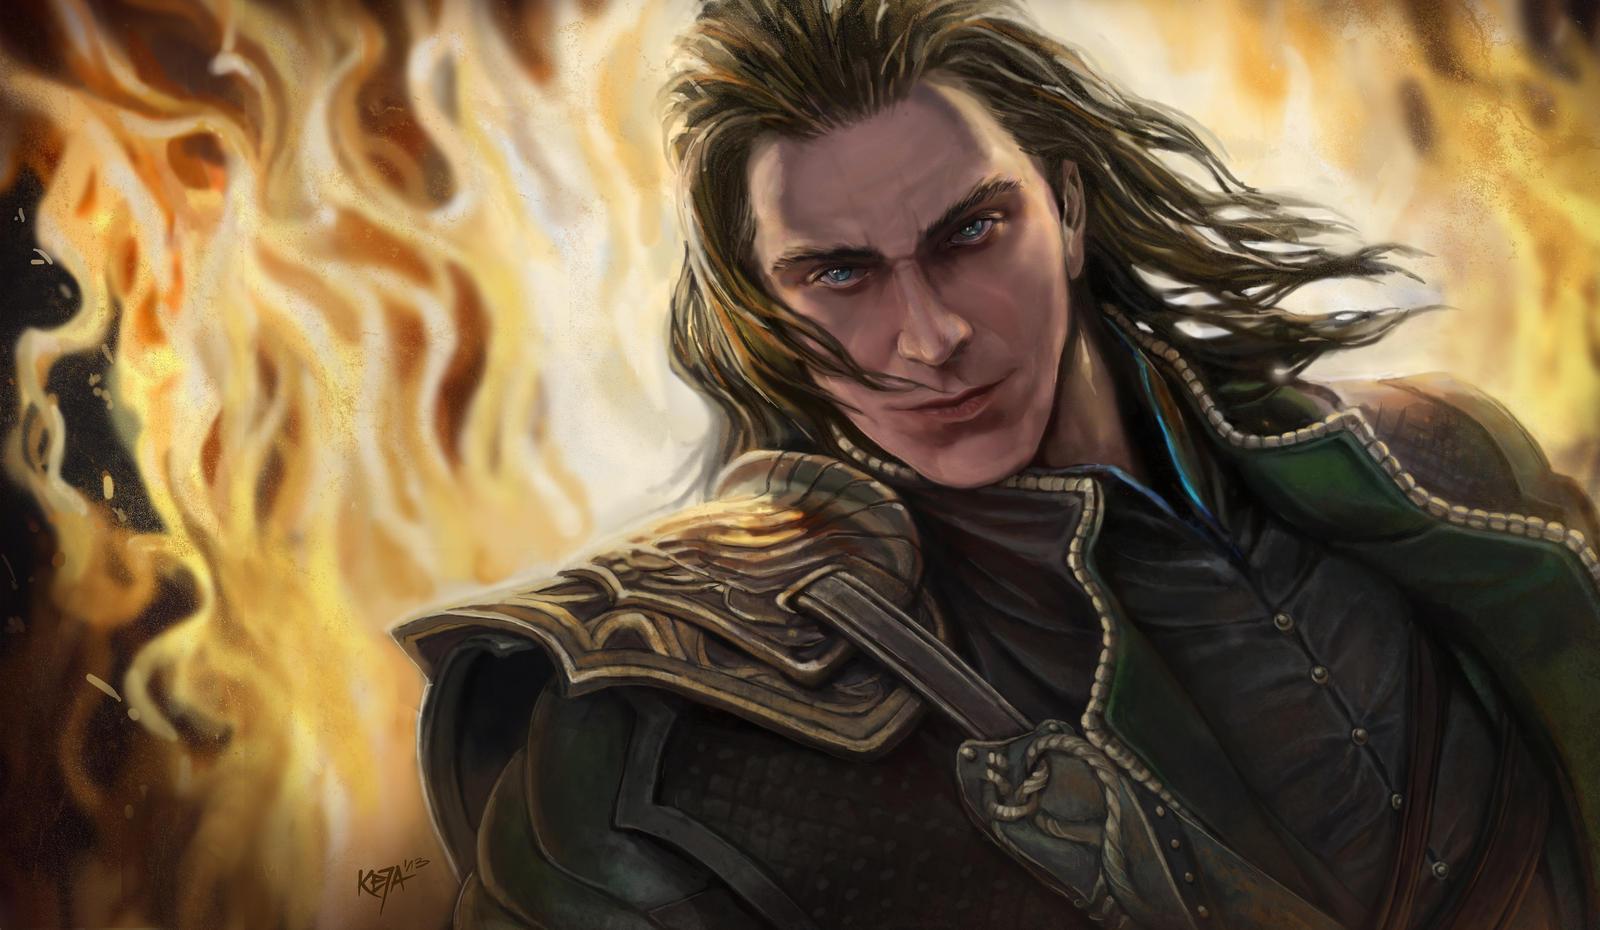 Fantasy warrior men - photo#20